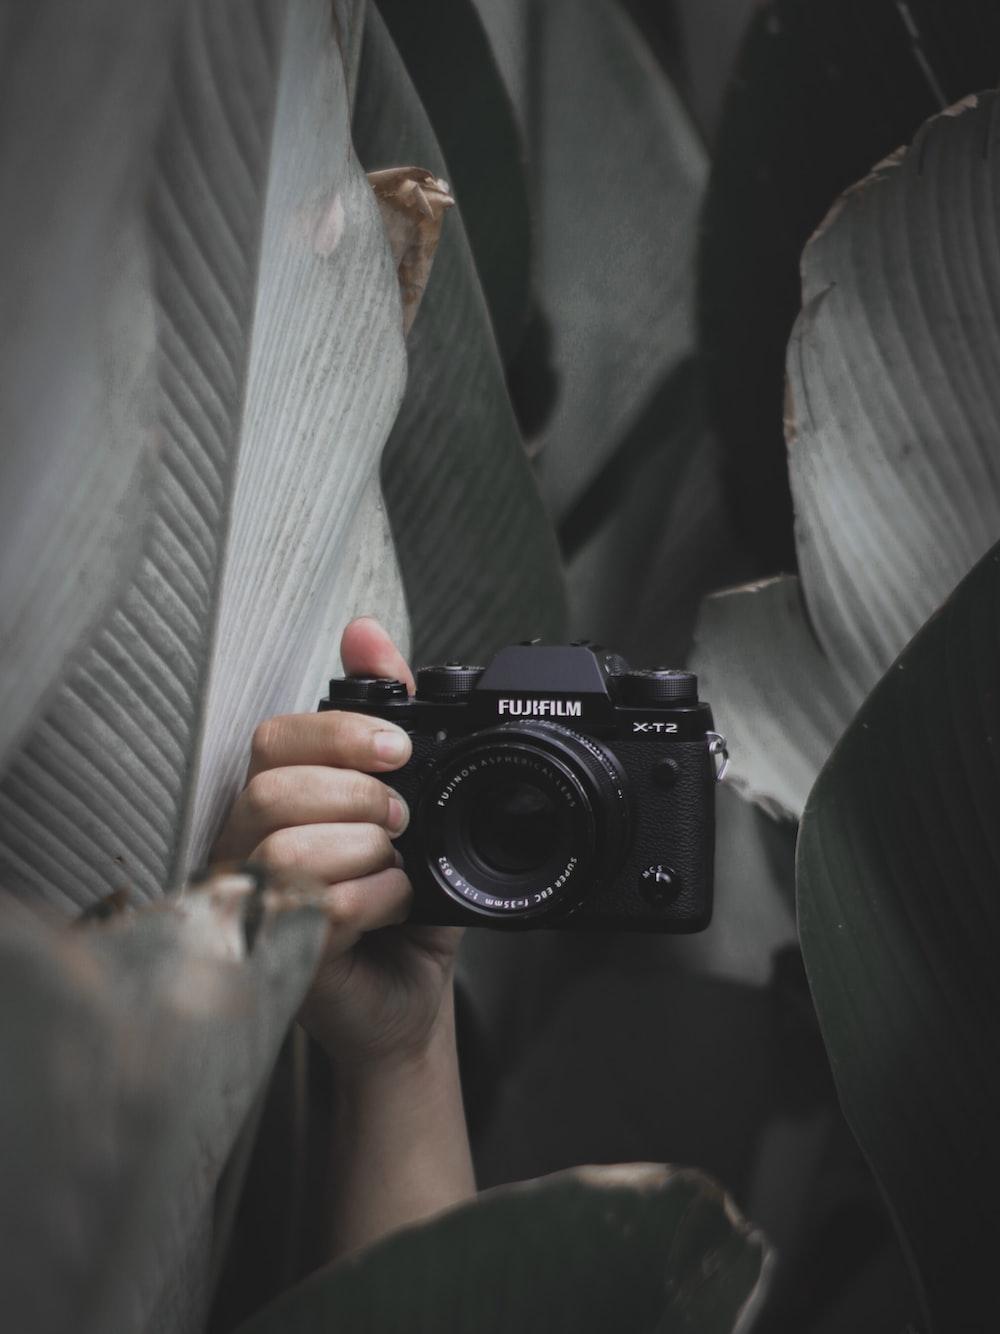 black Fujifilm DSLR camera